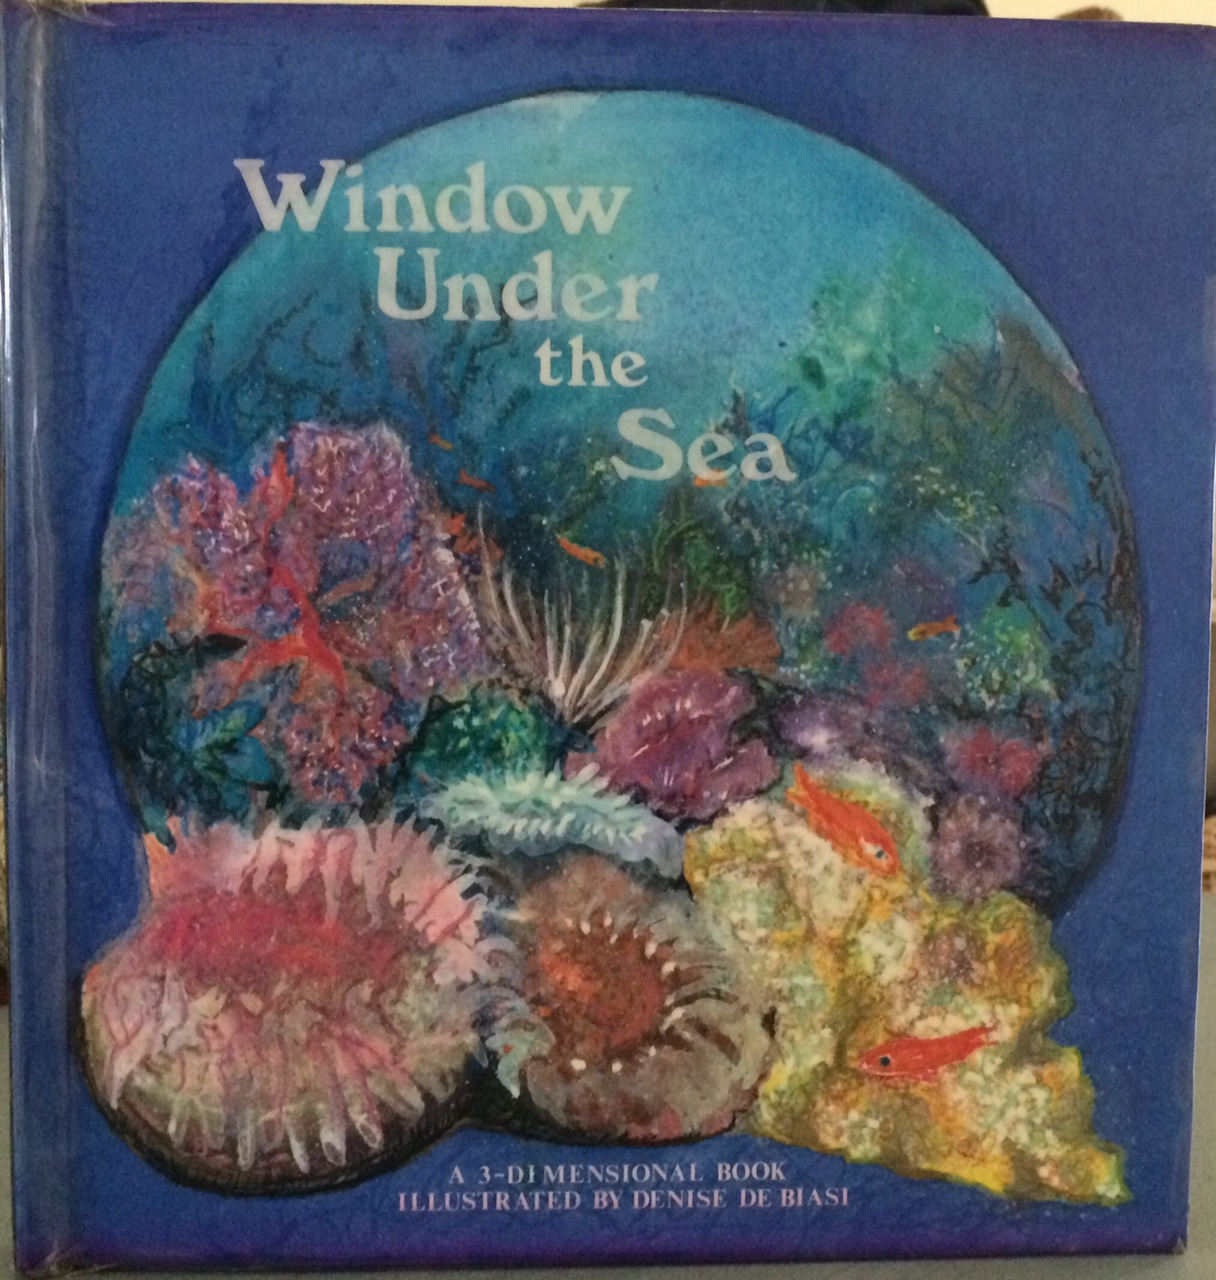 window under the sea.jpg